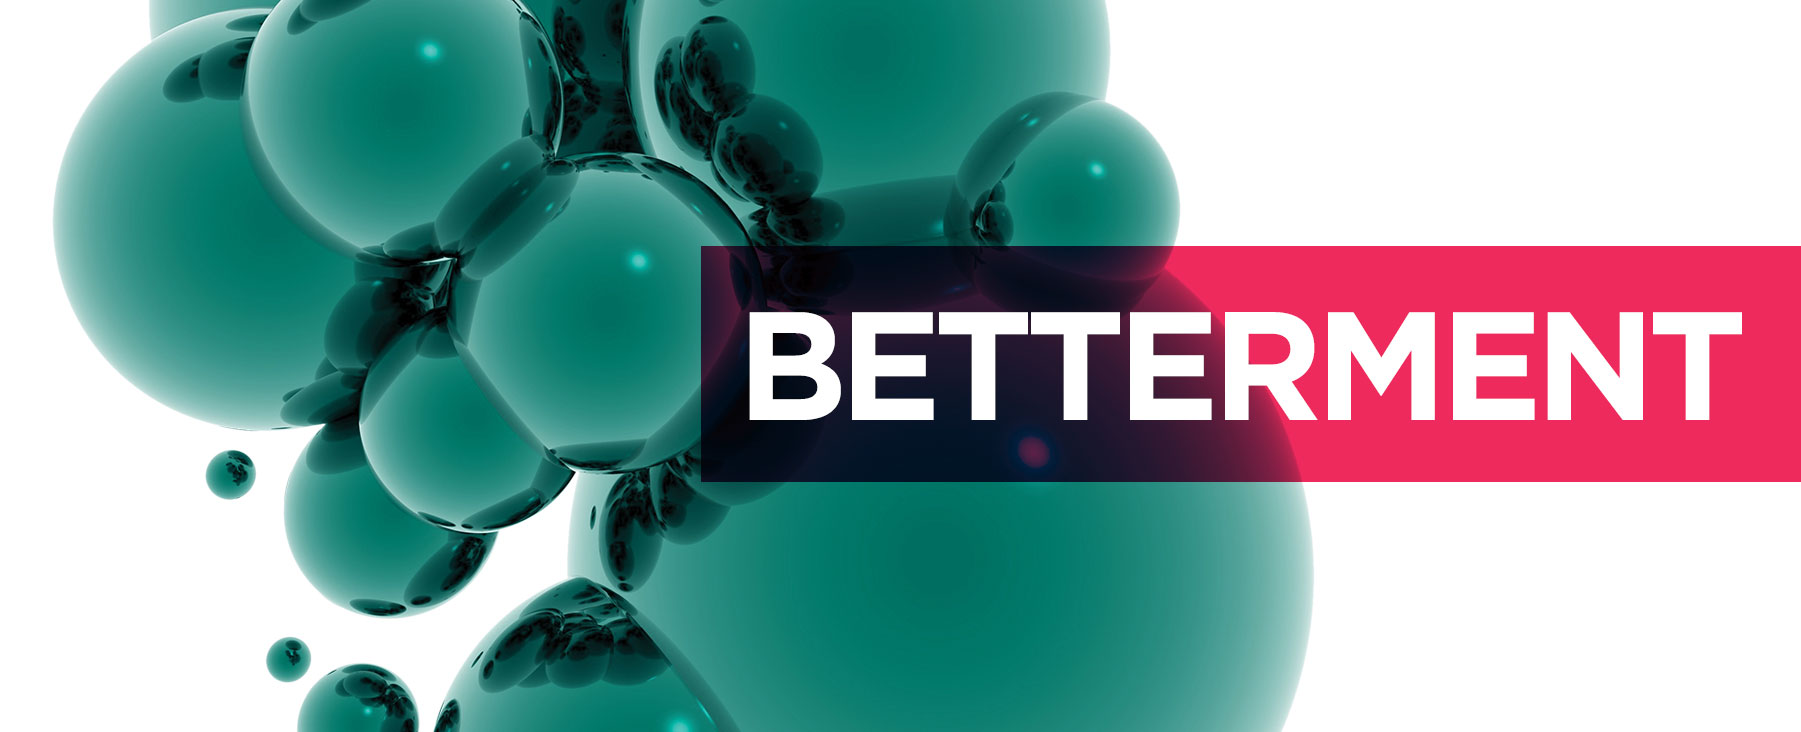 CO-OP THINK-Betterment